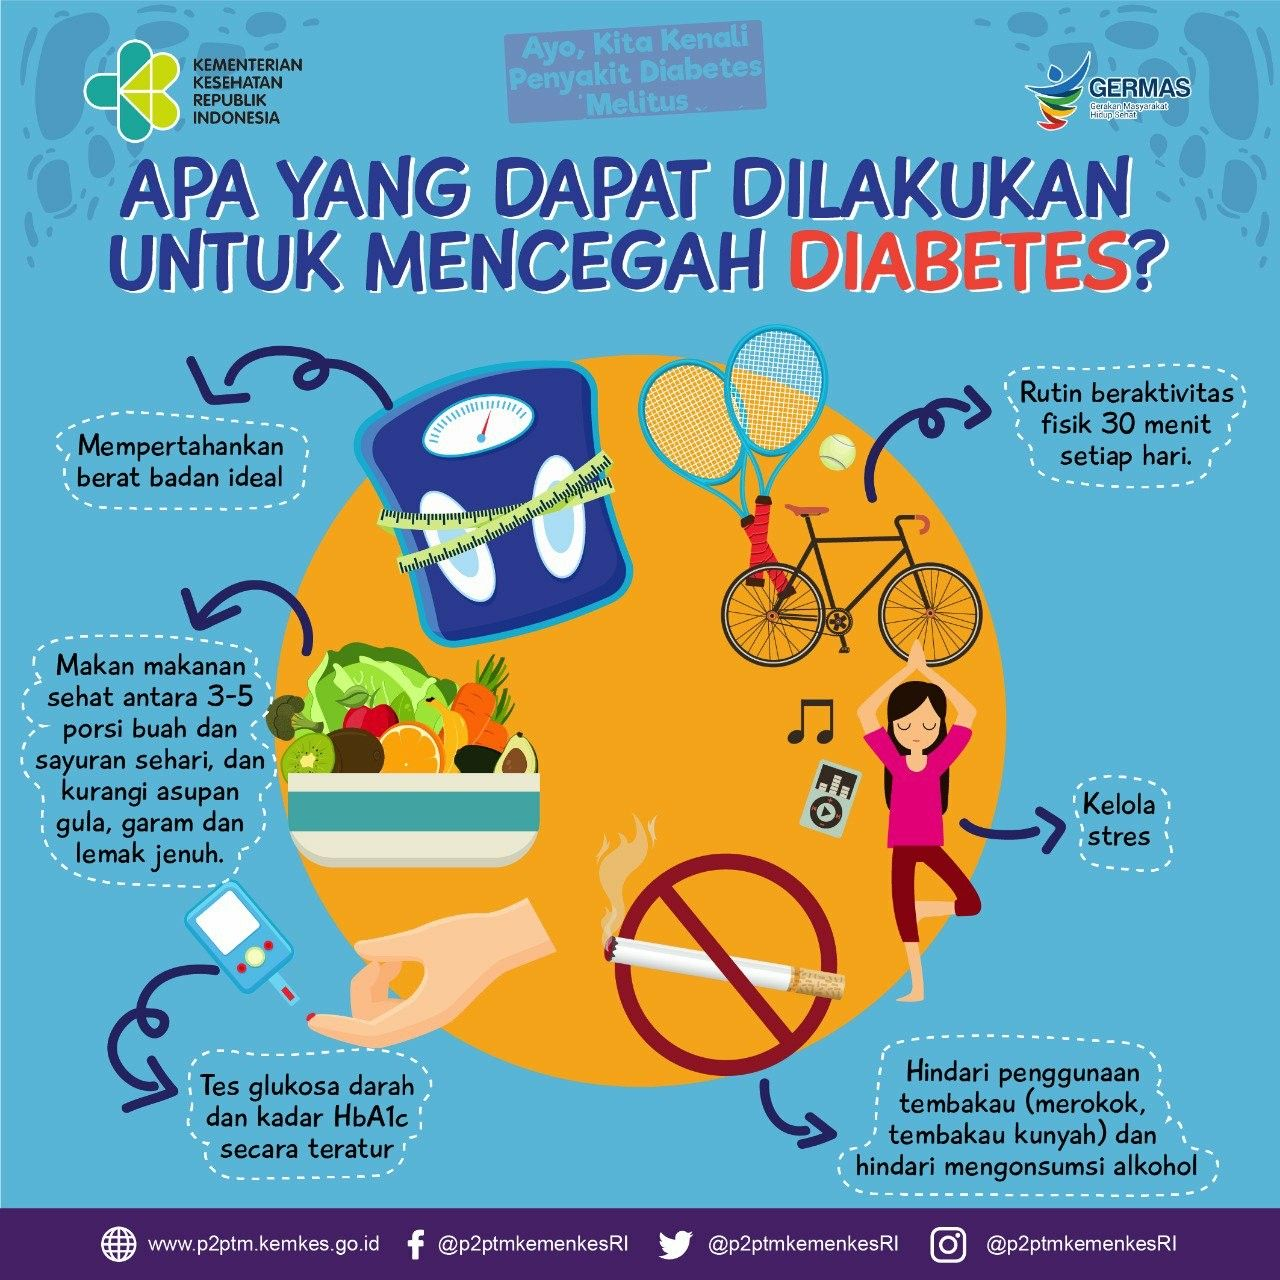 imagen del póster de diabetes